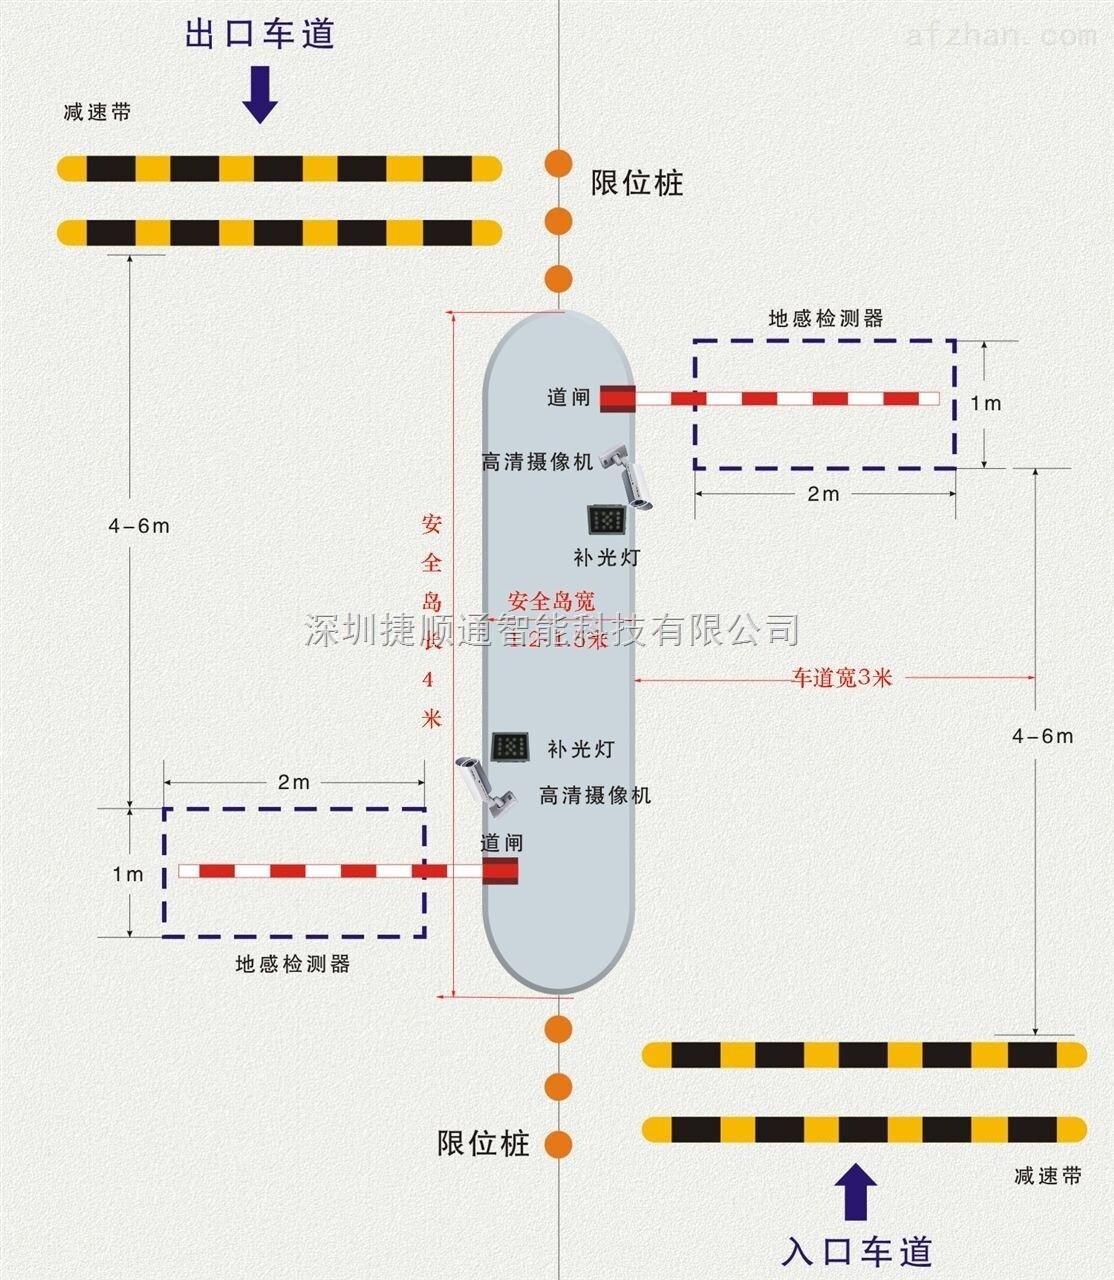 jst-sb01 安徽高清车牌识别系统,识别率最高的高清车牌识别系统